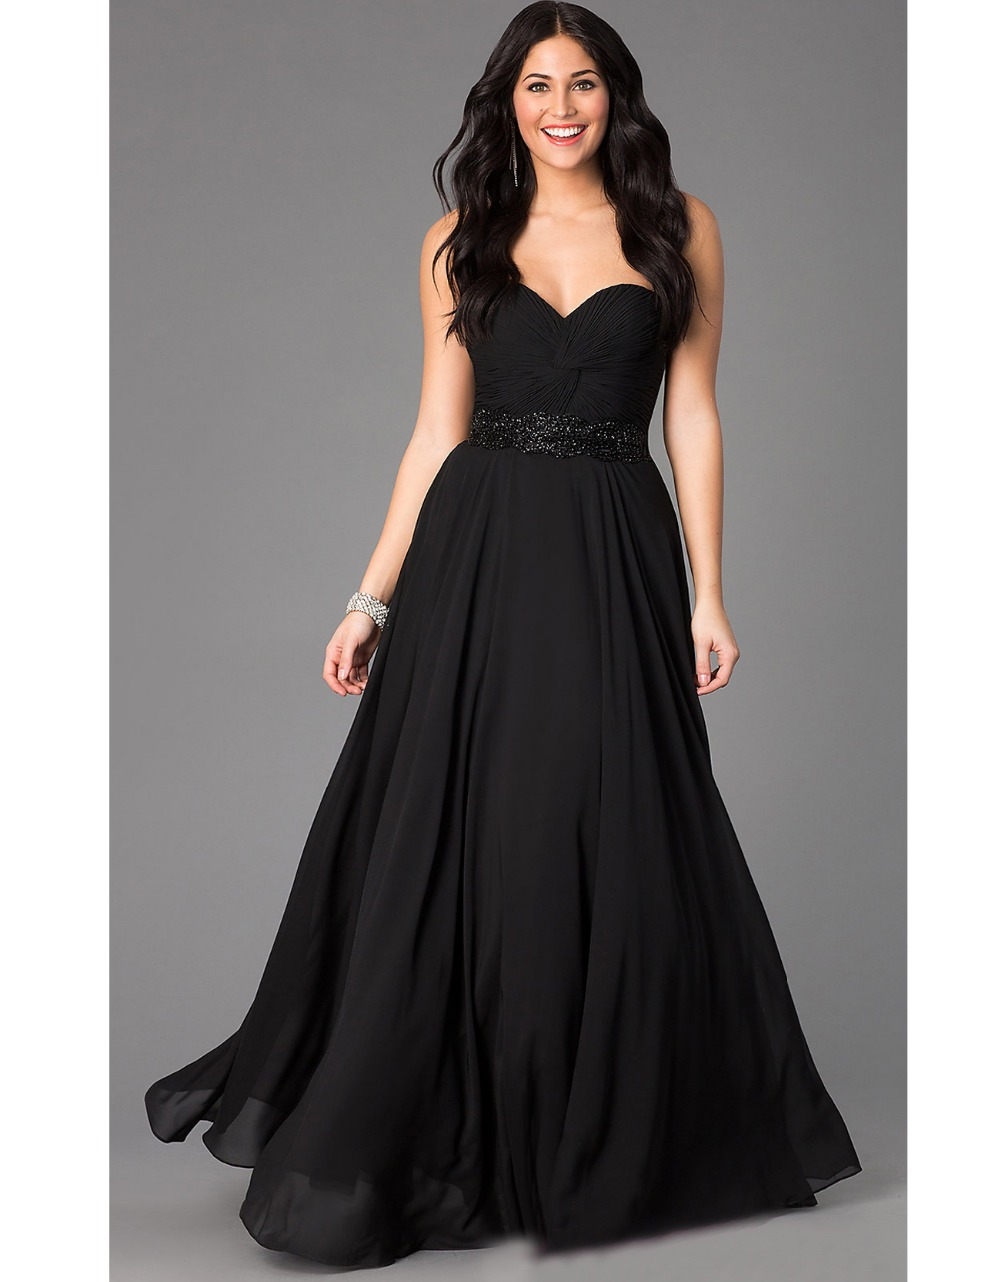 ad30520b889 Formal Dresses Black Long | Huston Fislar Photography